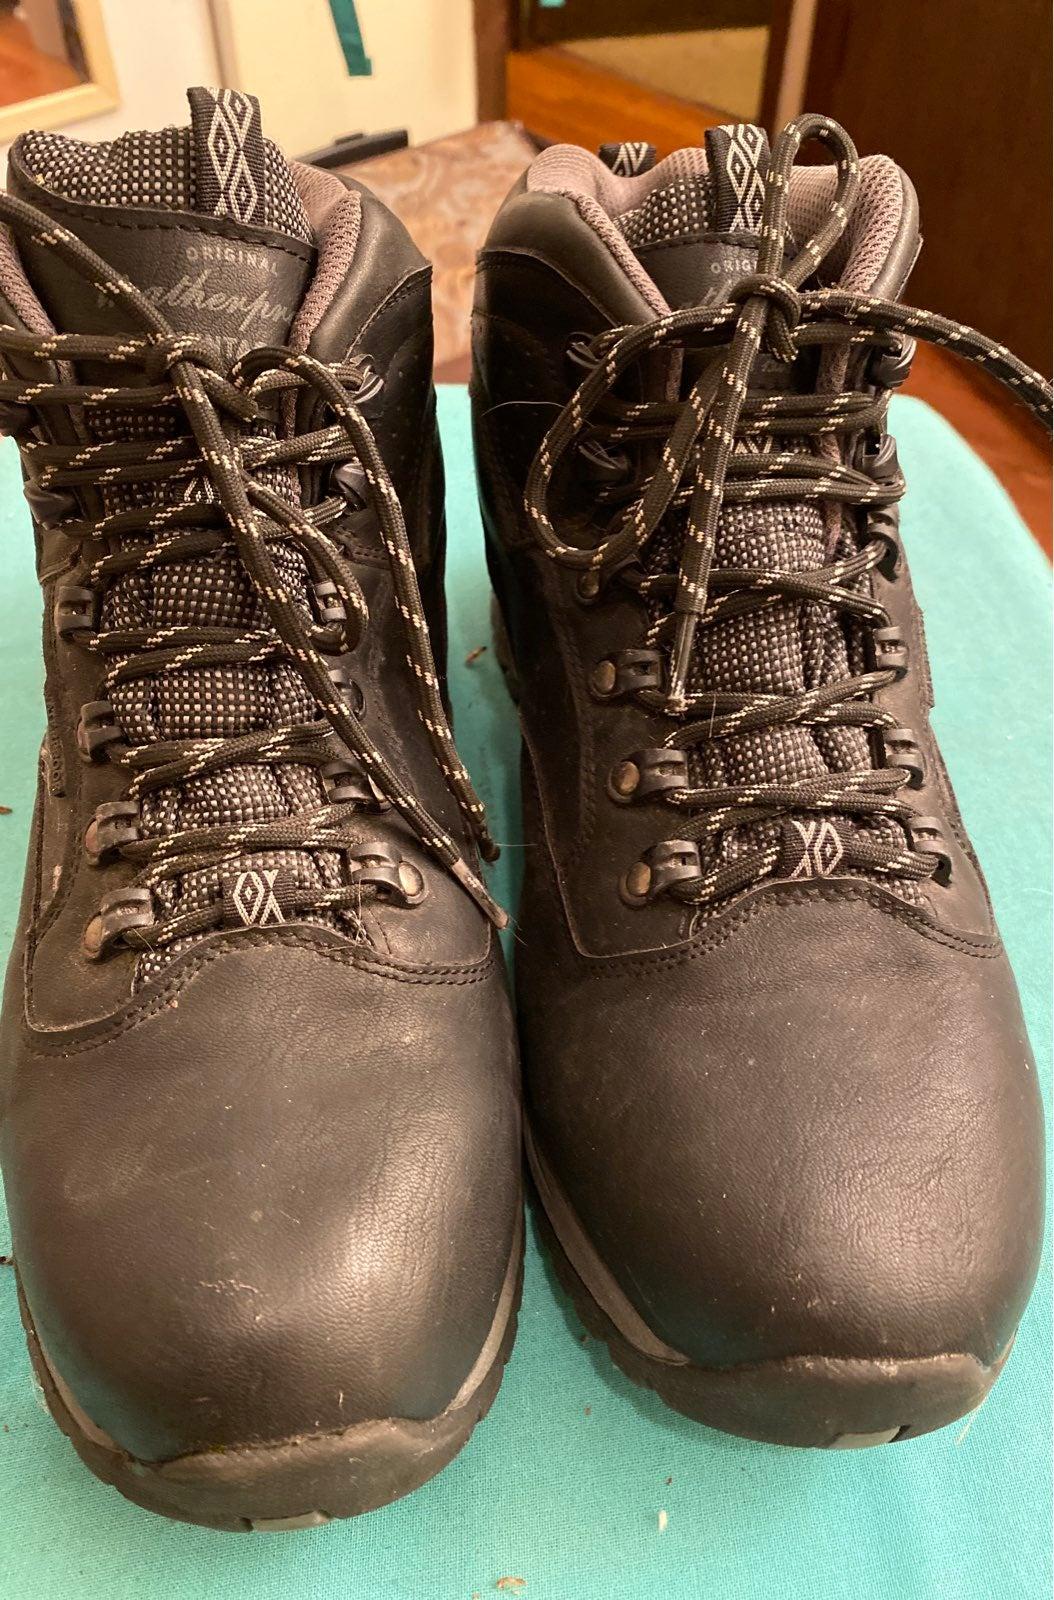 Weatherproof Trailblazer Boots, size 10M